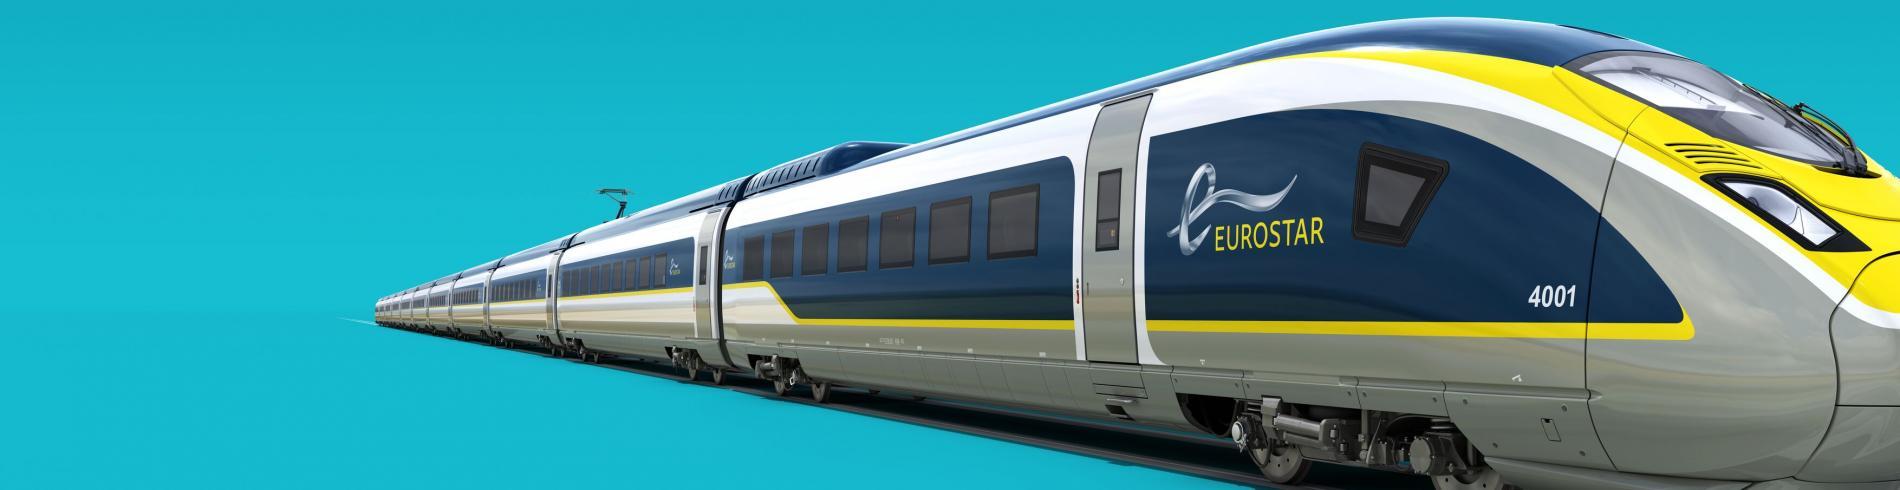 E320 Eurostar train on blue background